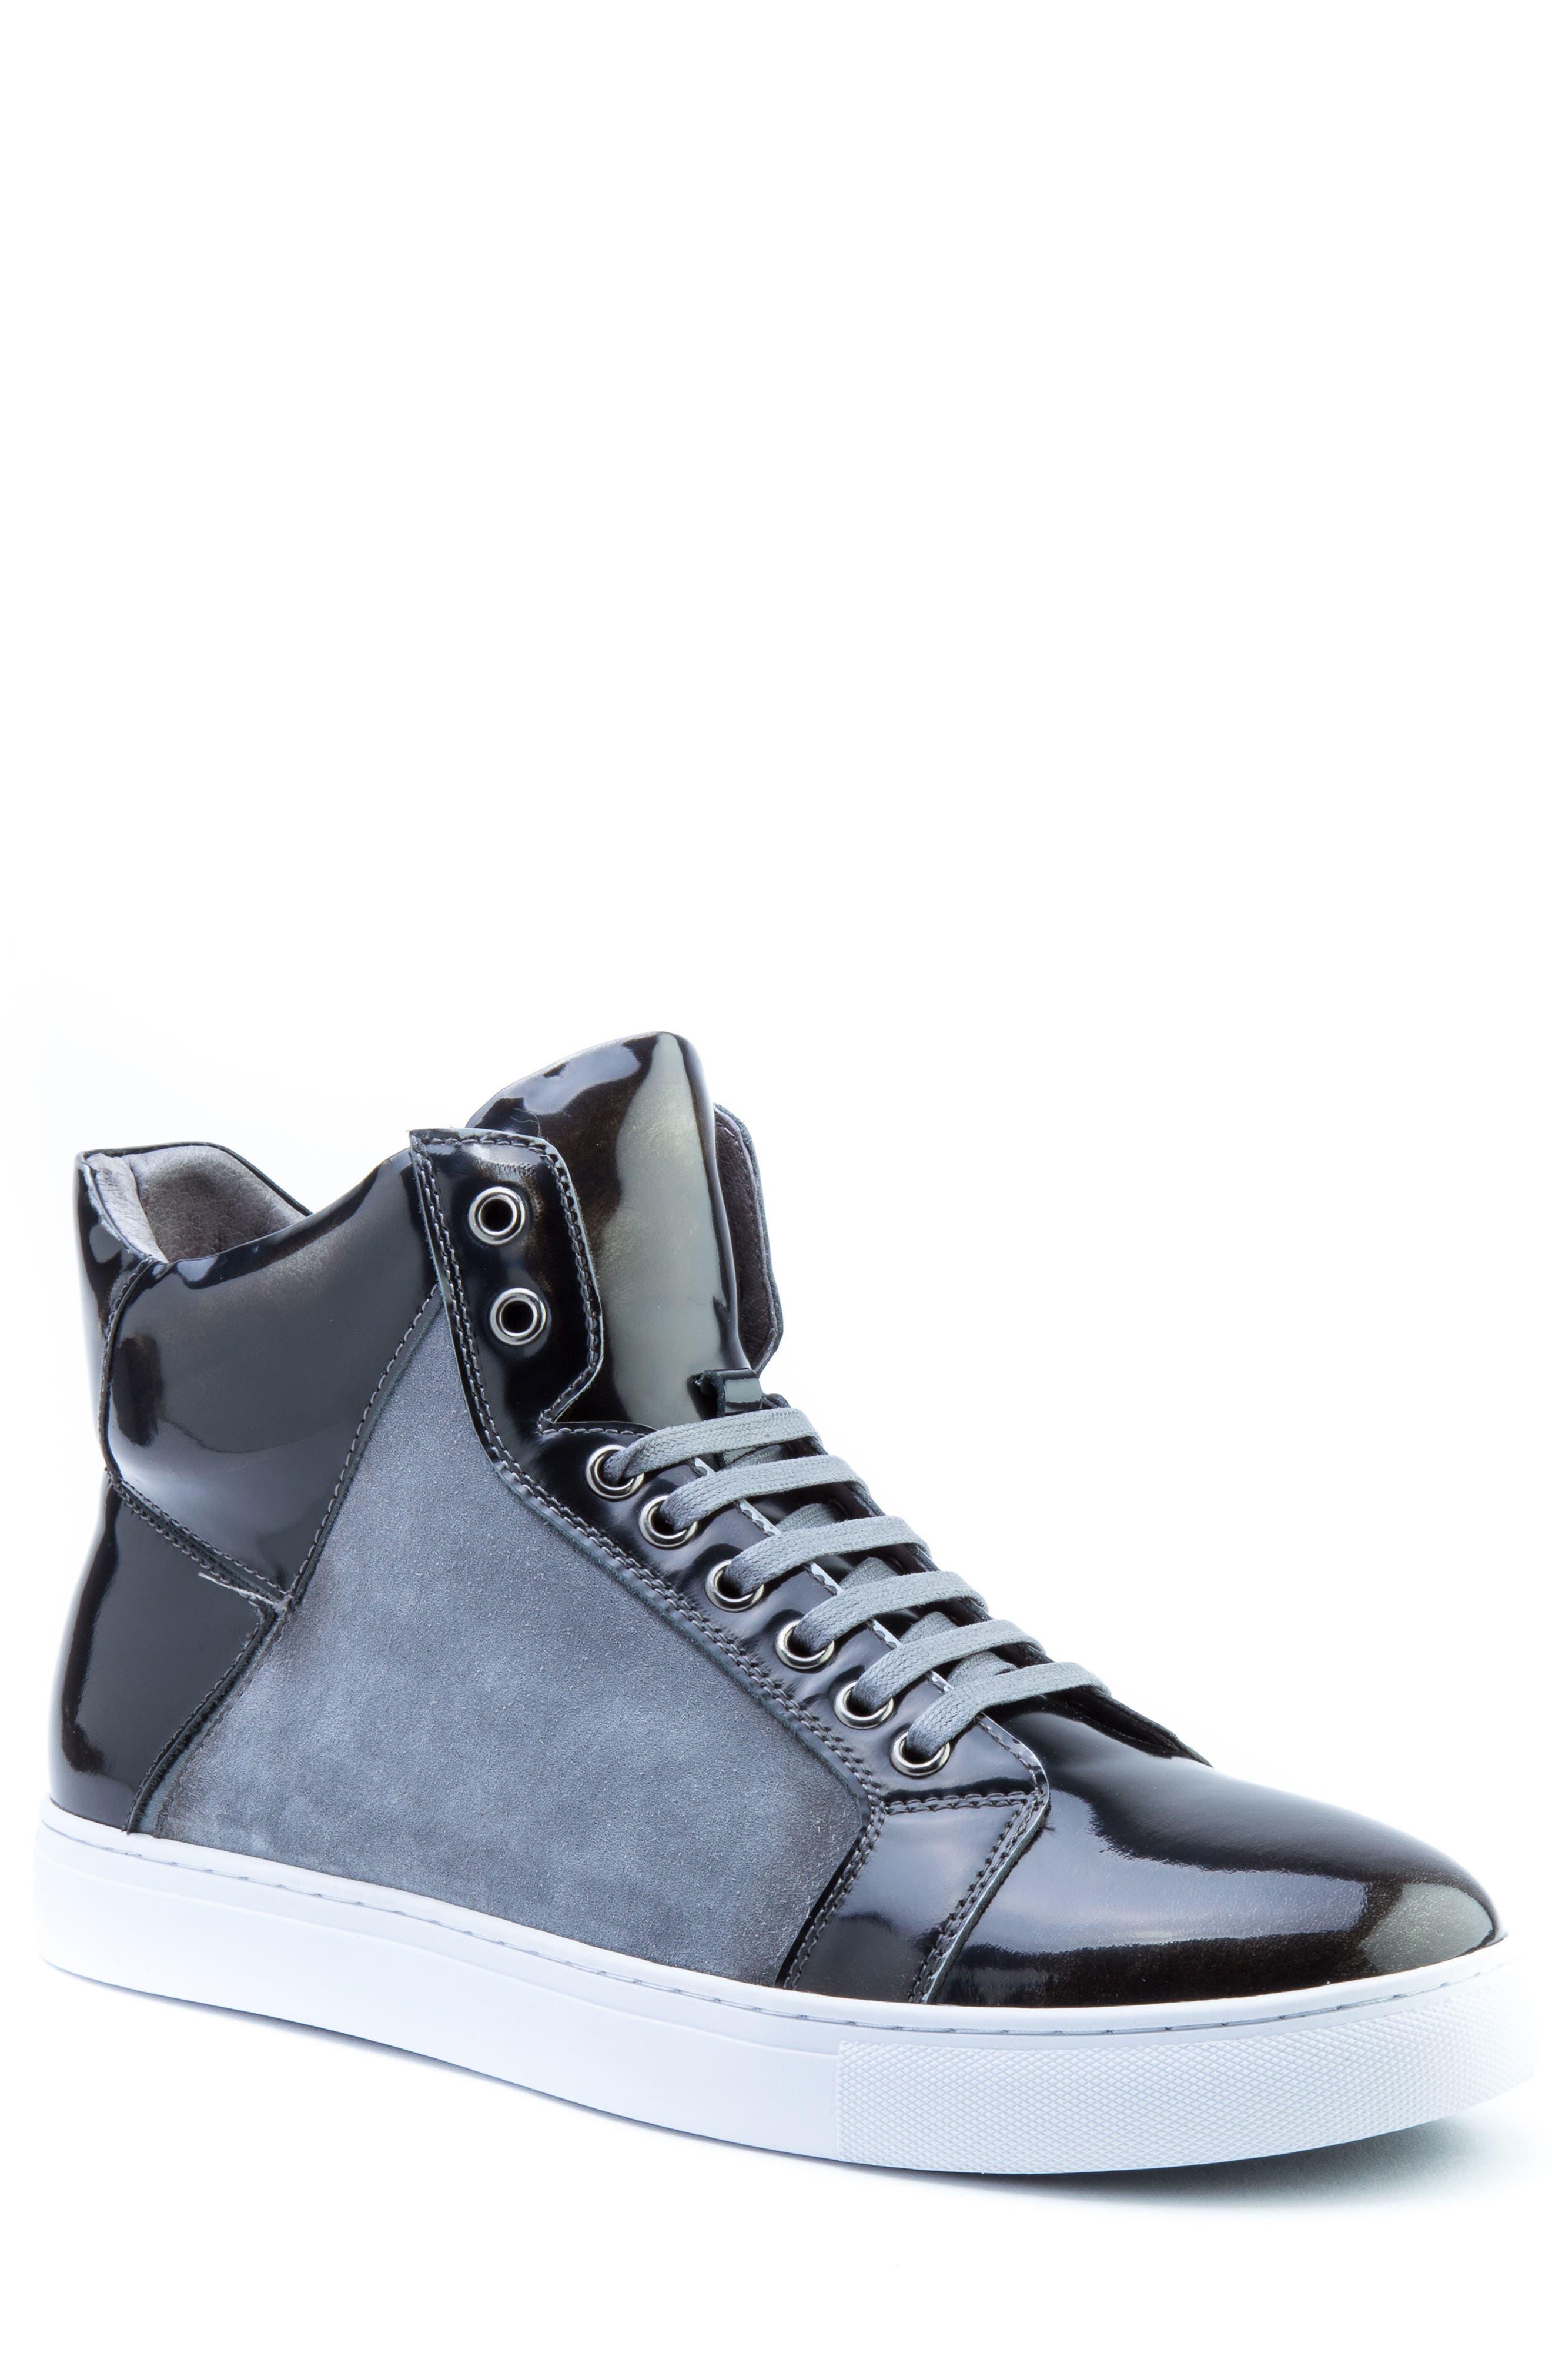 Douglas High Top Sneaker,                         Main,                         color, BLACK LEATHER